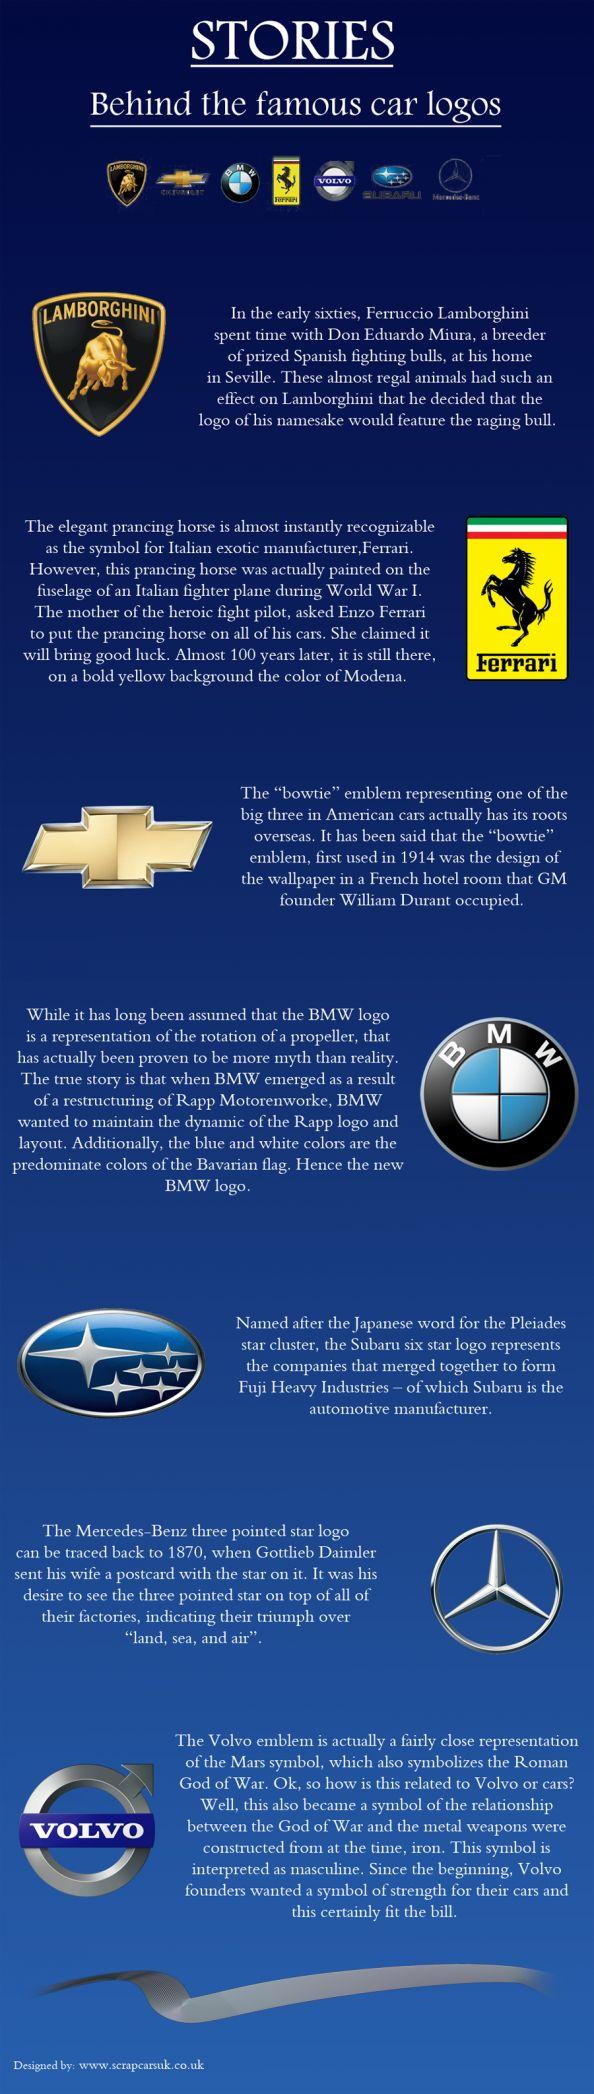 Best 25 car brand symbols ideas on pinterest car symbols car brands and car logos